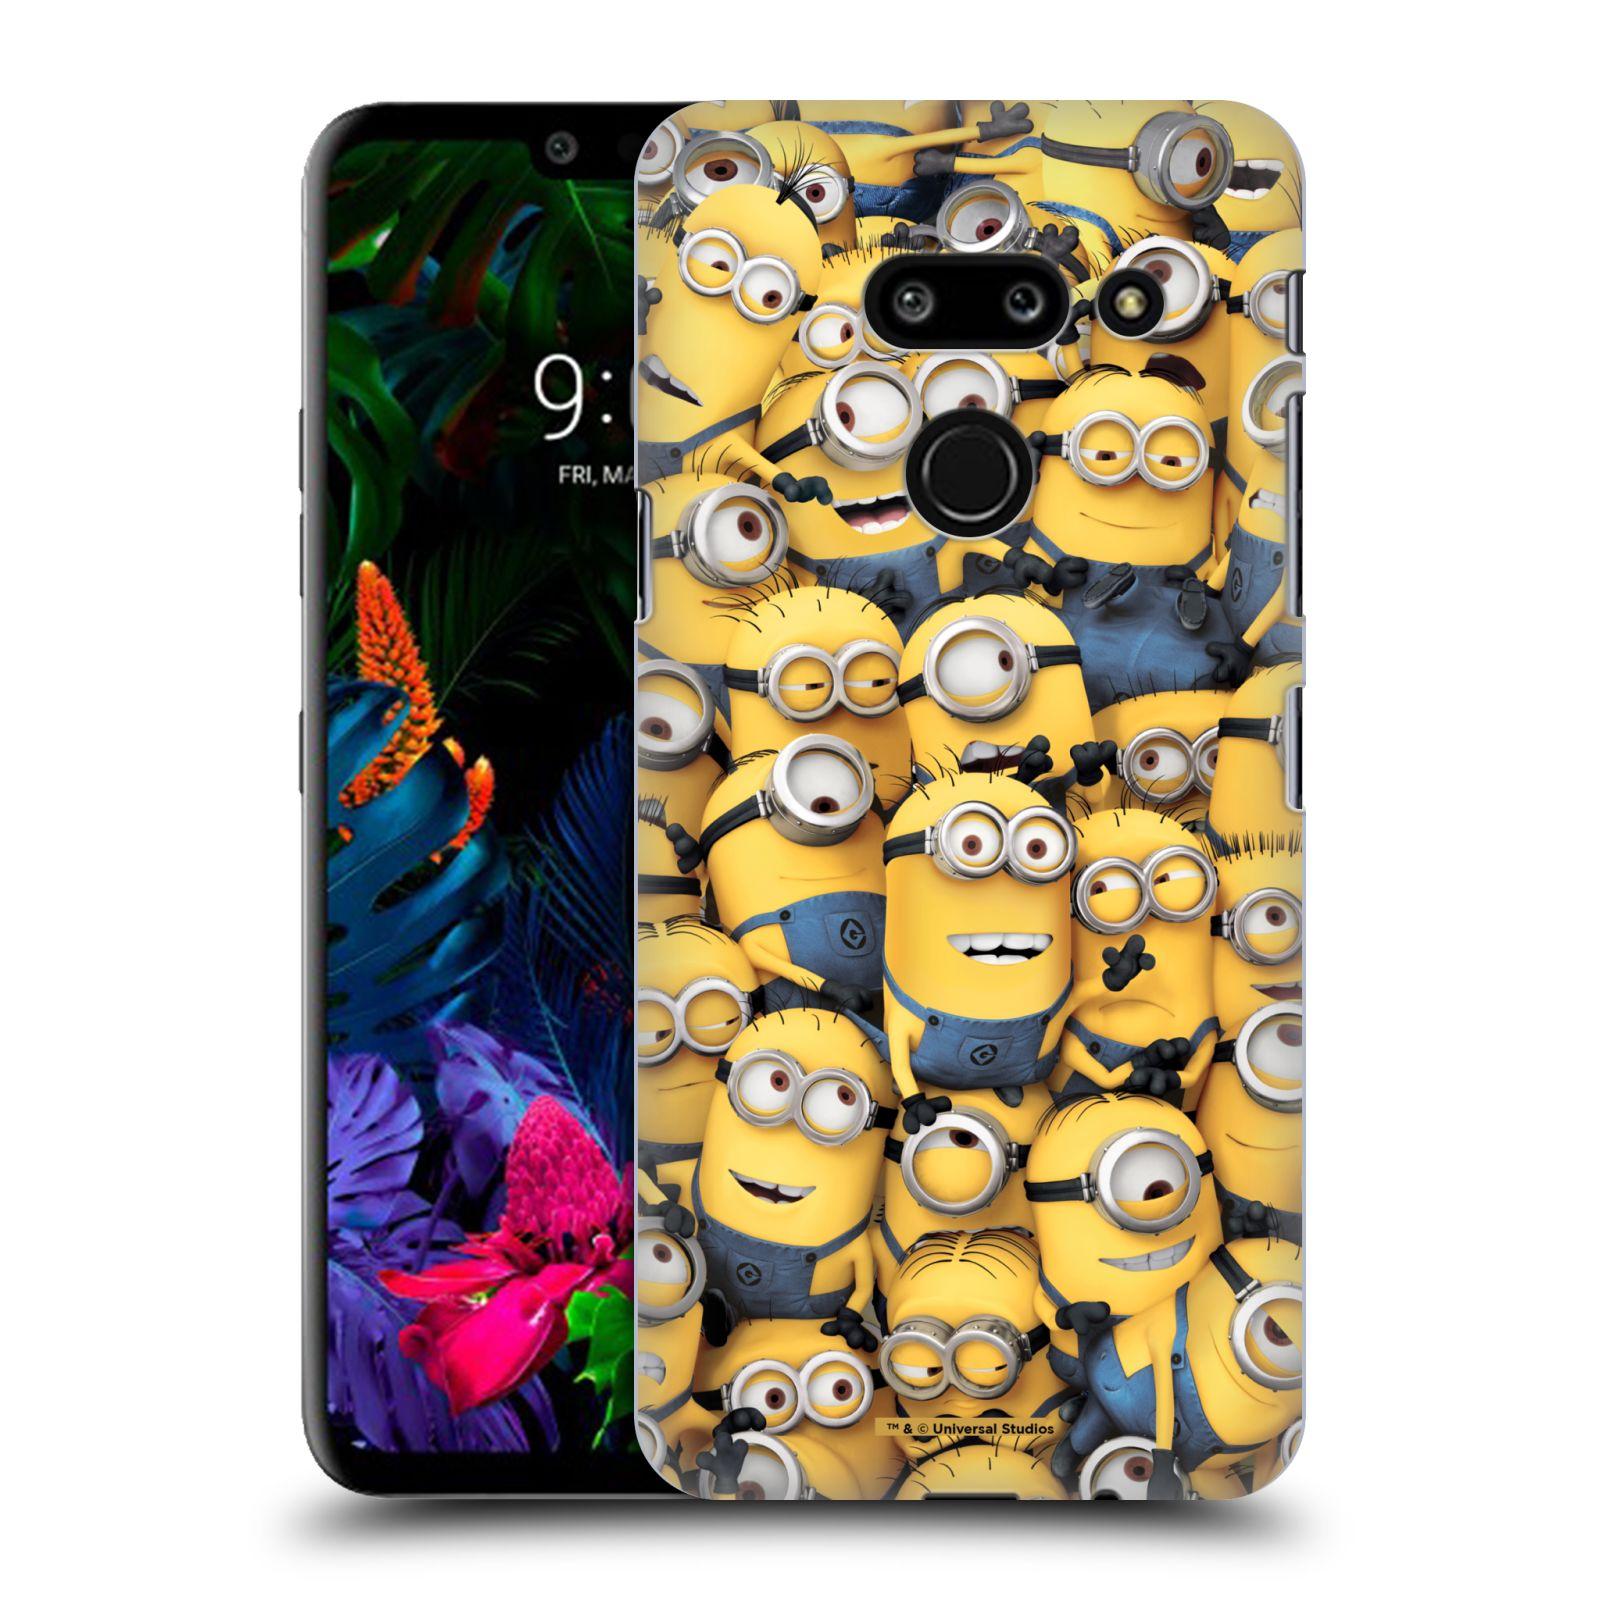 Plastové pouzdro na mobil LG G8 ThinQ - Head Case - Mimoni všude z filmu Já, padouch - Despicable Me